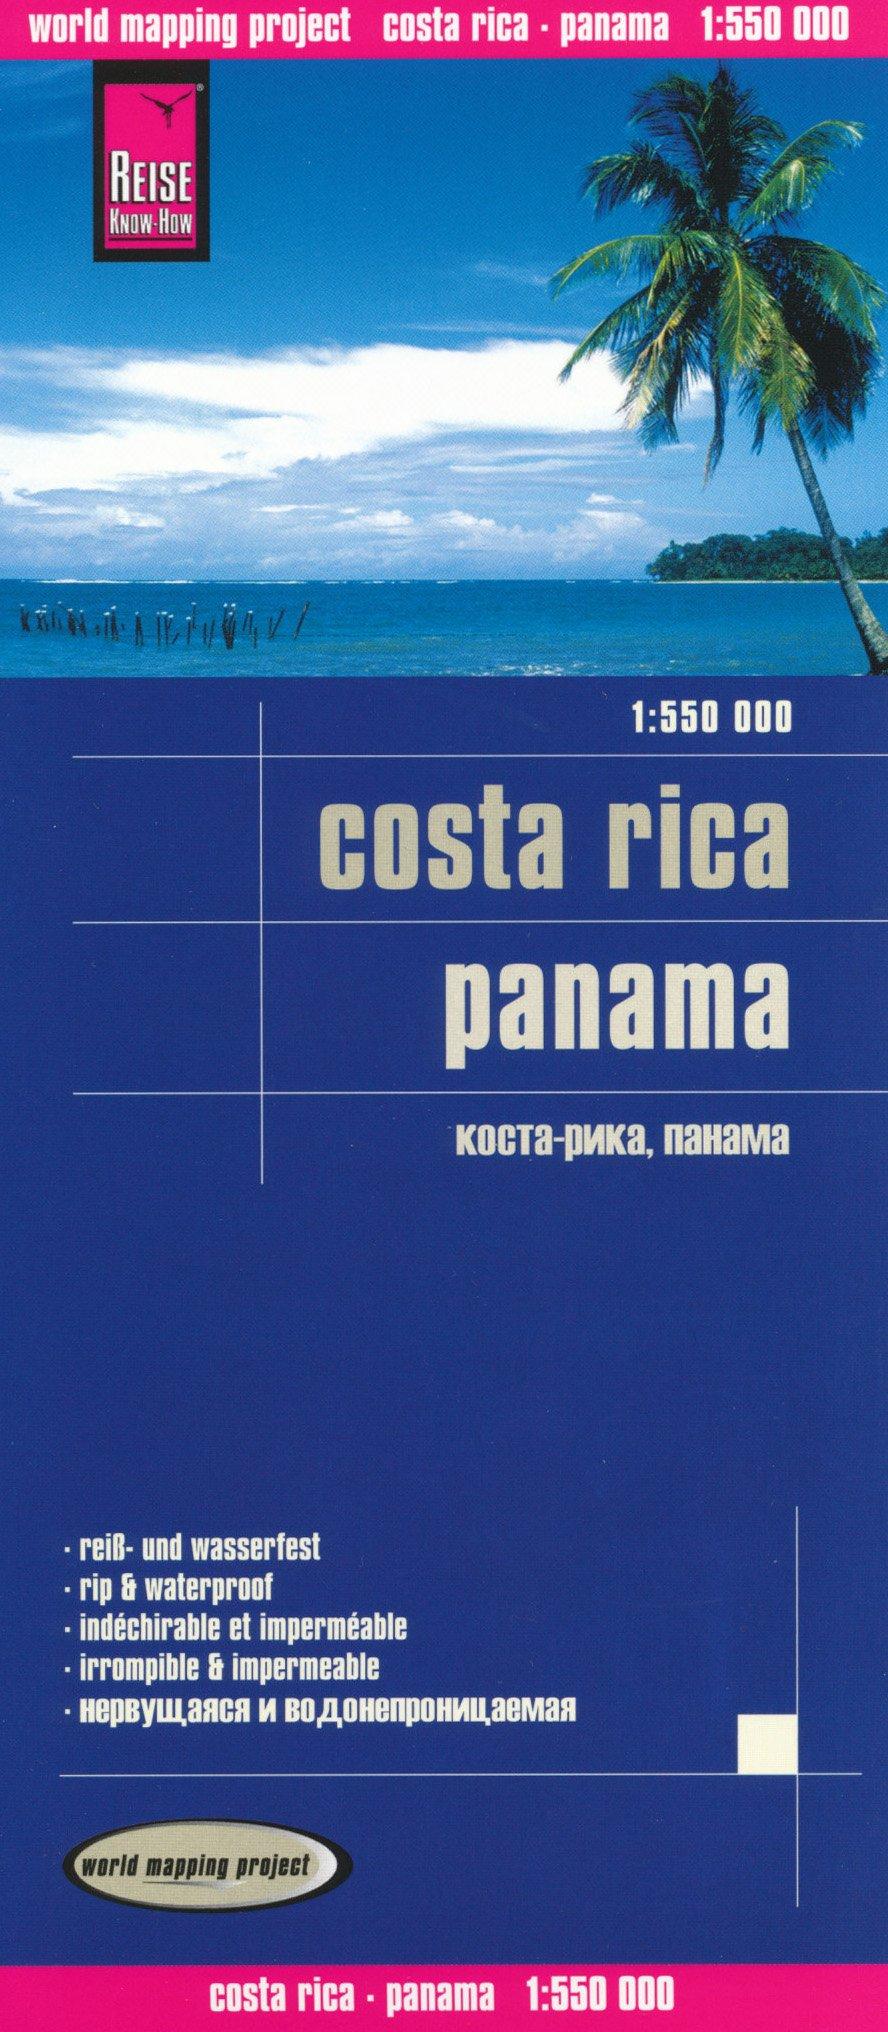 Panama & Costa Rica 1:550,000 Travel Map, waterproof, GPS-compatible REISE